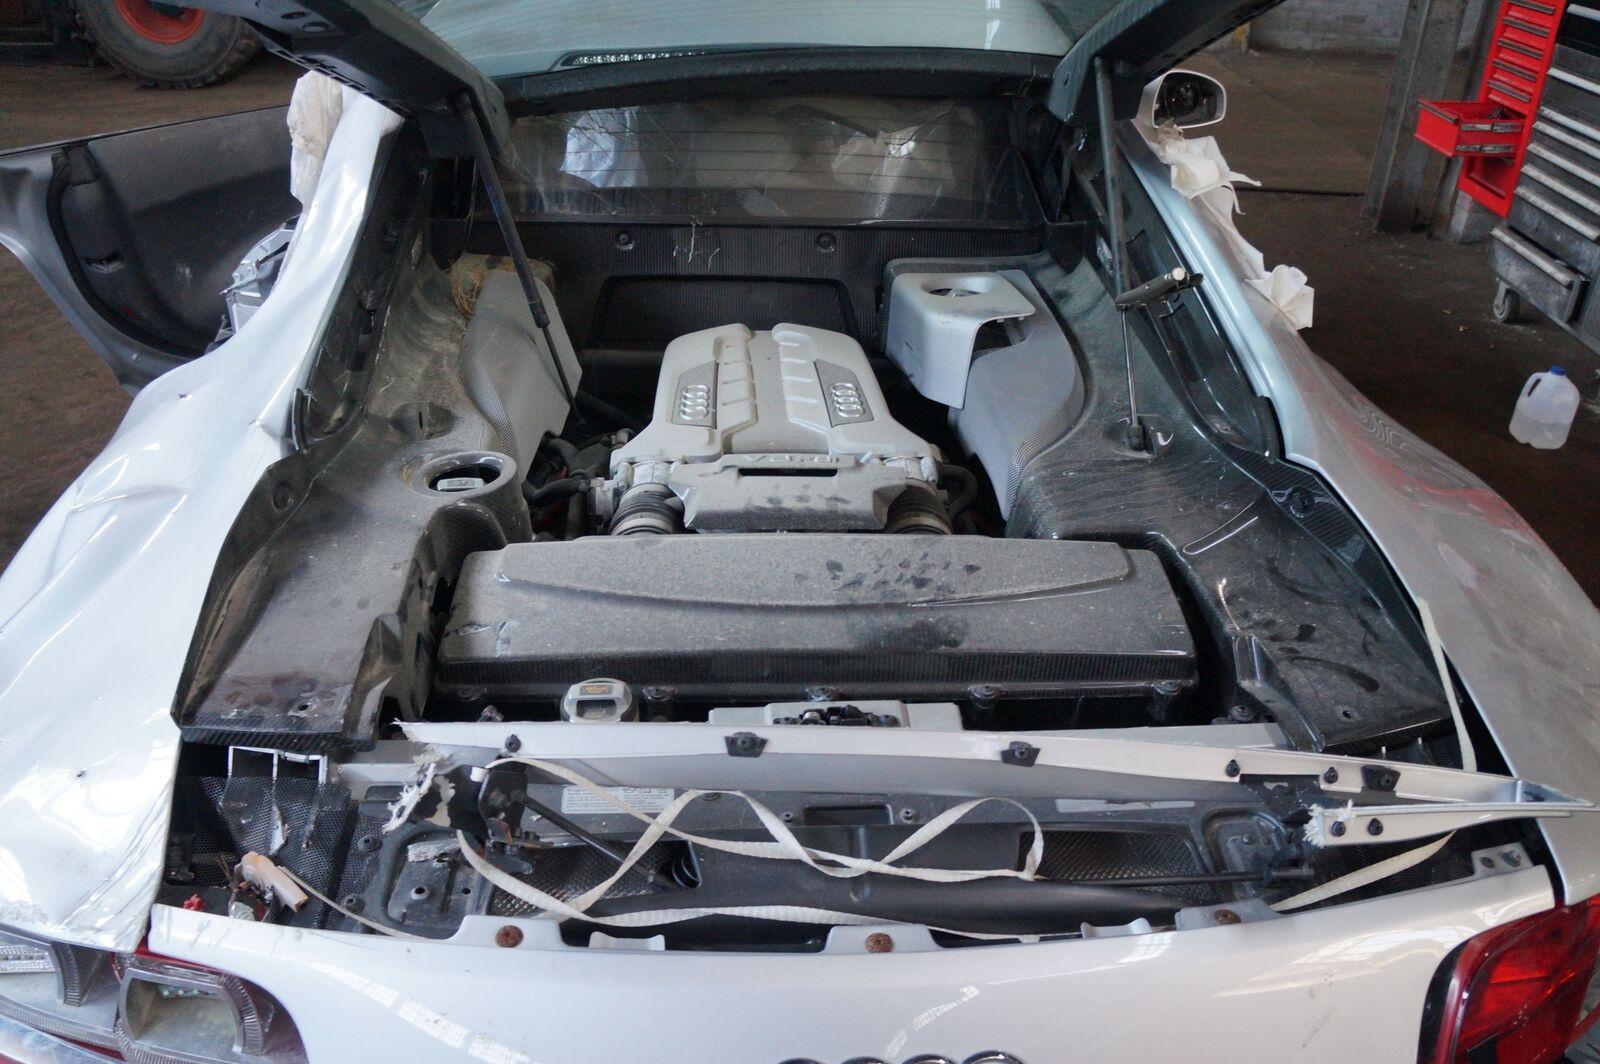 Audi R8 Fuse Box Electronic Wiring Diagrams Audi R8 Fuse Box Audi R8 Fuse  Box